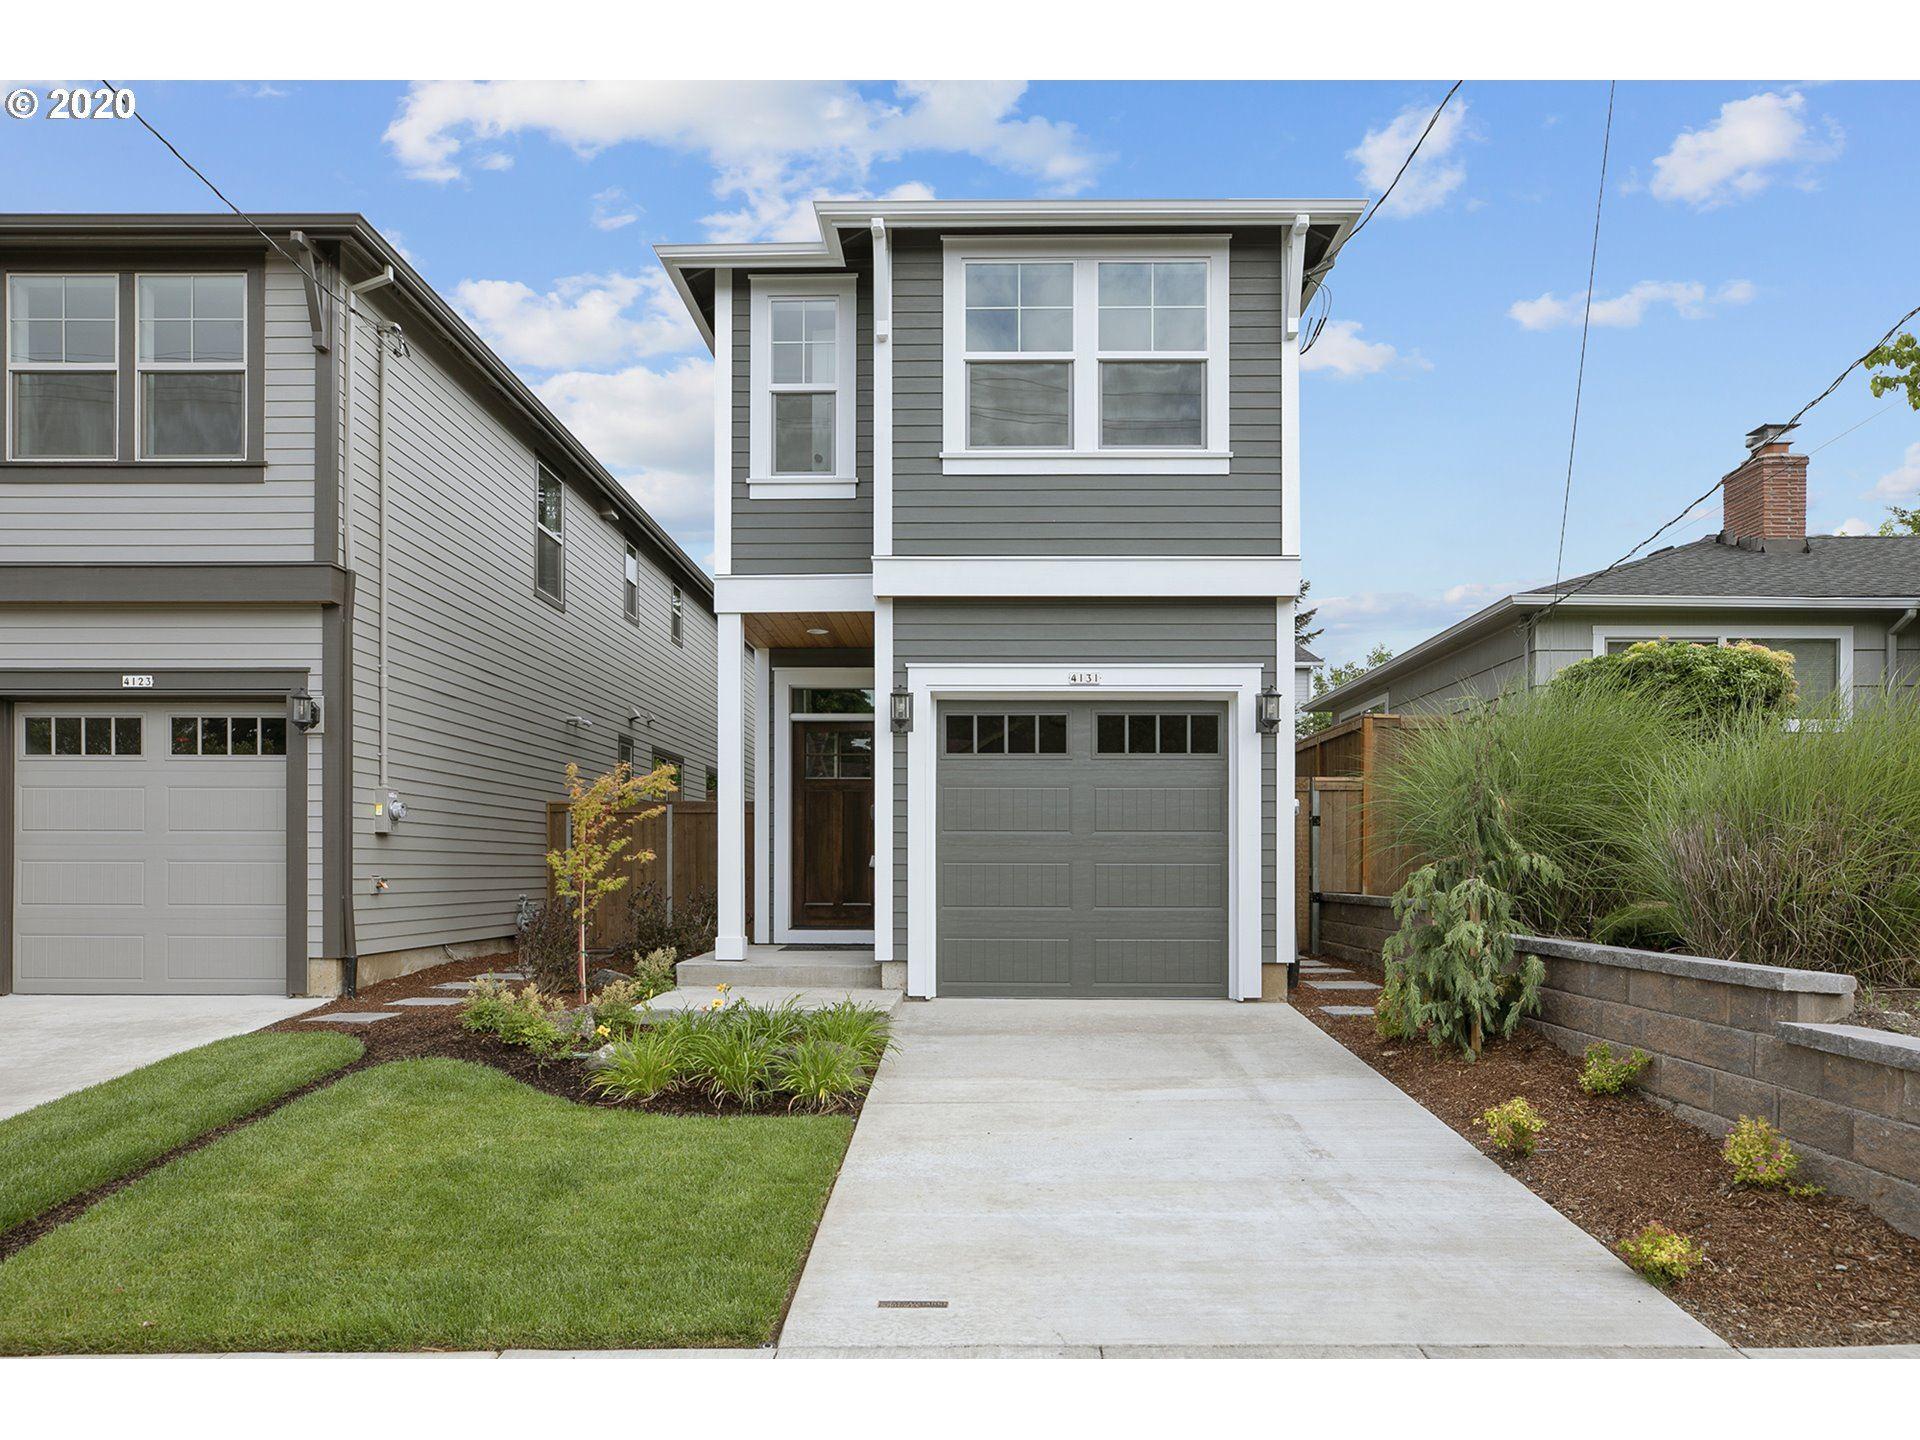 4131 SE Bybee BLVD, Portland, OR 97202 - MLS#: 20185937